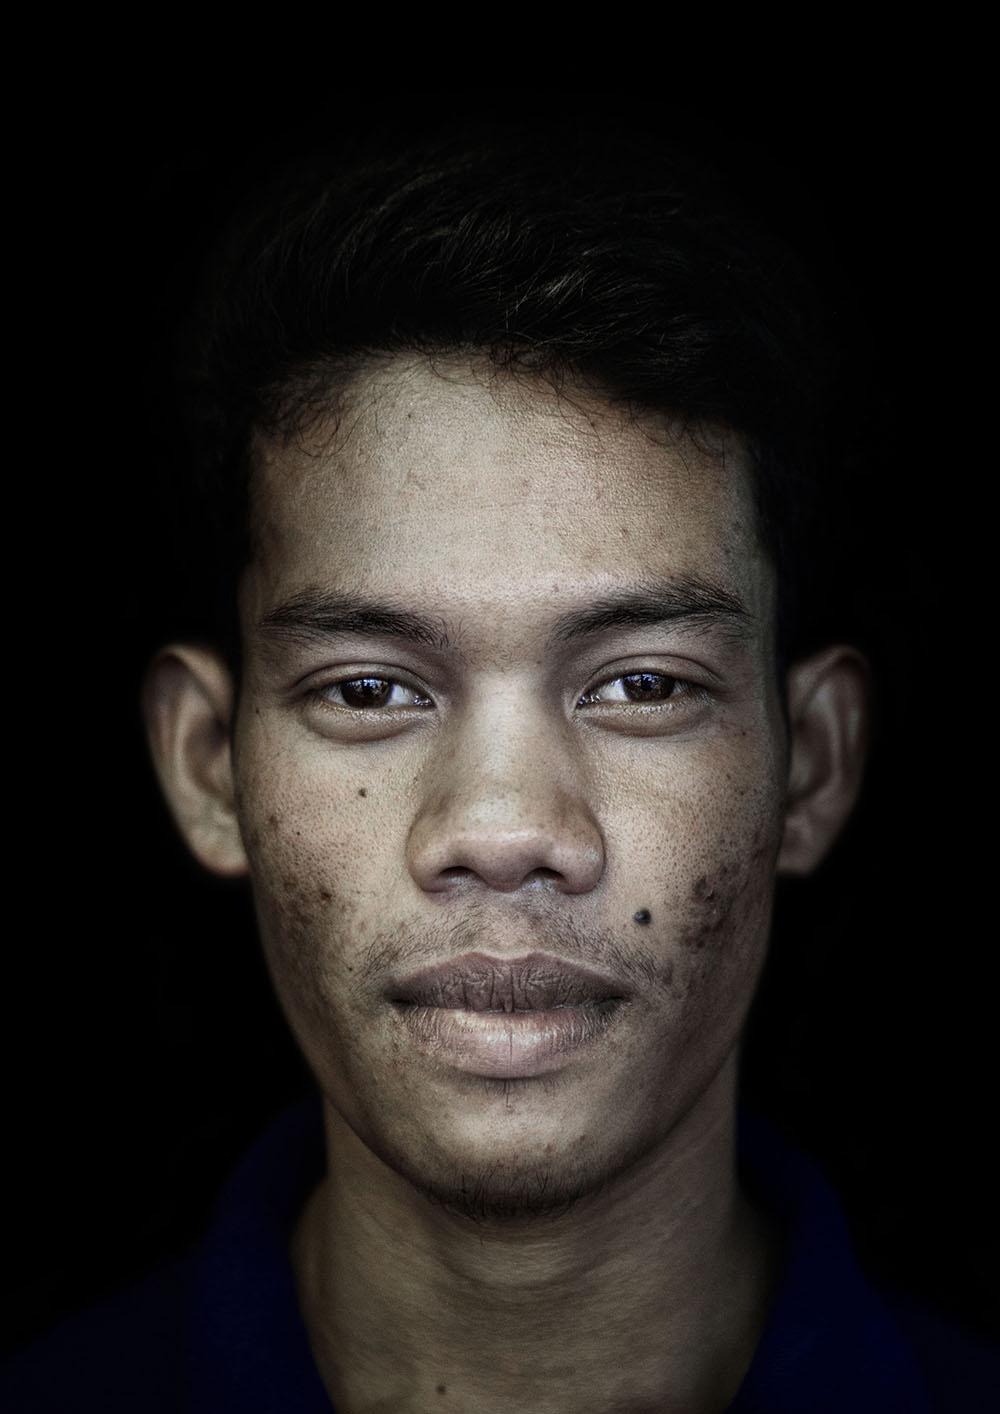 Portrait_Phnom Penh_06 Kopie.jpg